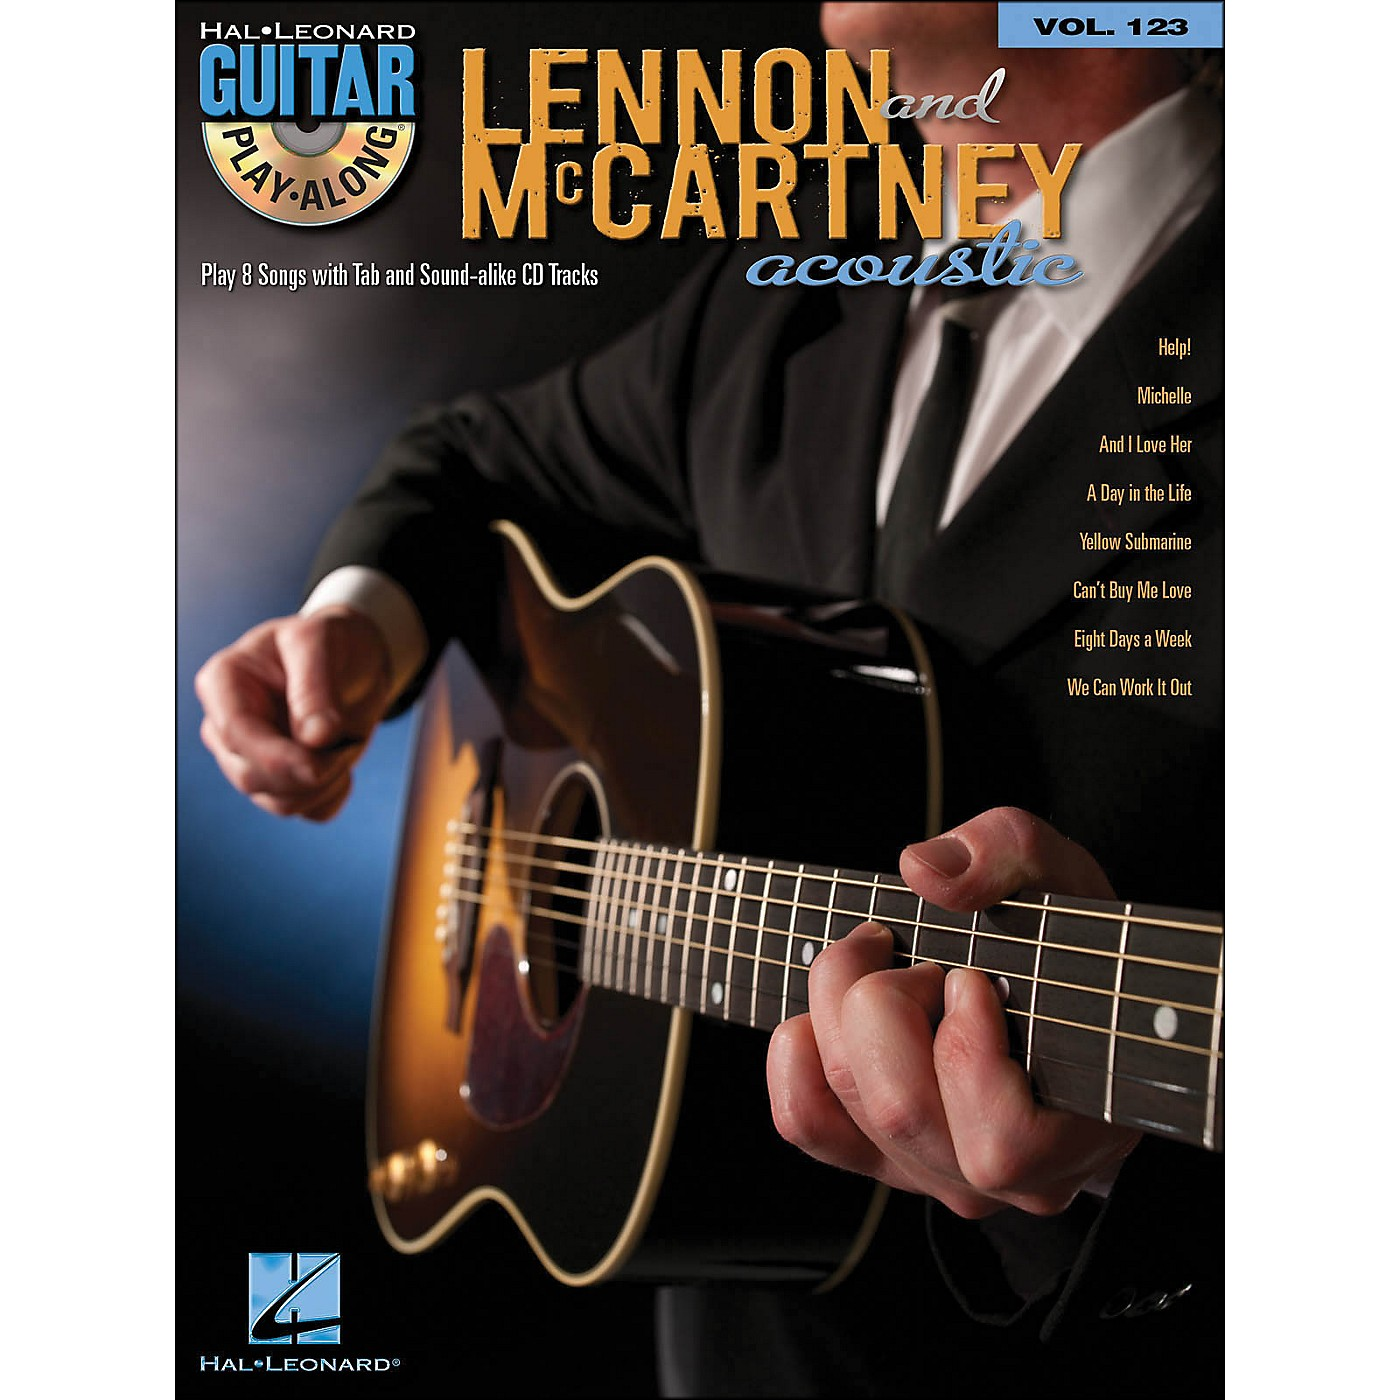 Hal Leonard Lennon & Mccartney Acoustic - Guitar Play-Along Volume 123 (Book/CD) thumbnail